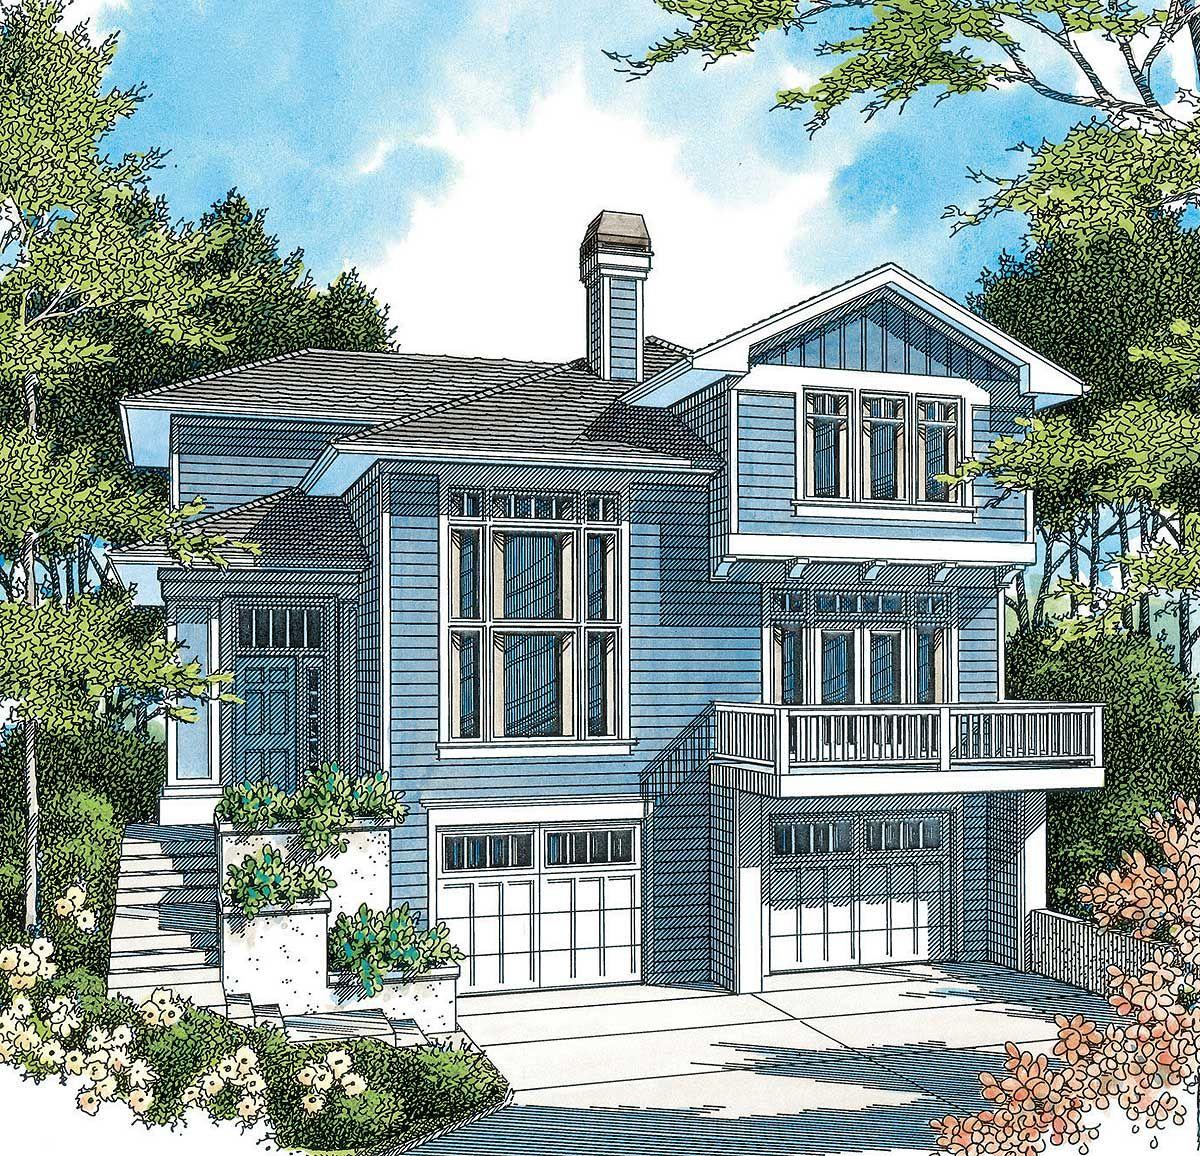 Hillside Plan With Garage Under 69131am: Plan 69180AM: Hillside Home Plan With Options